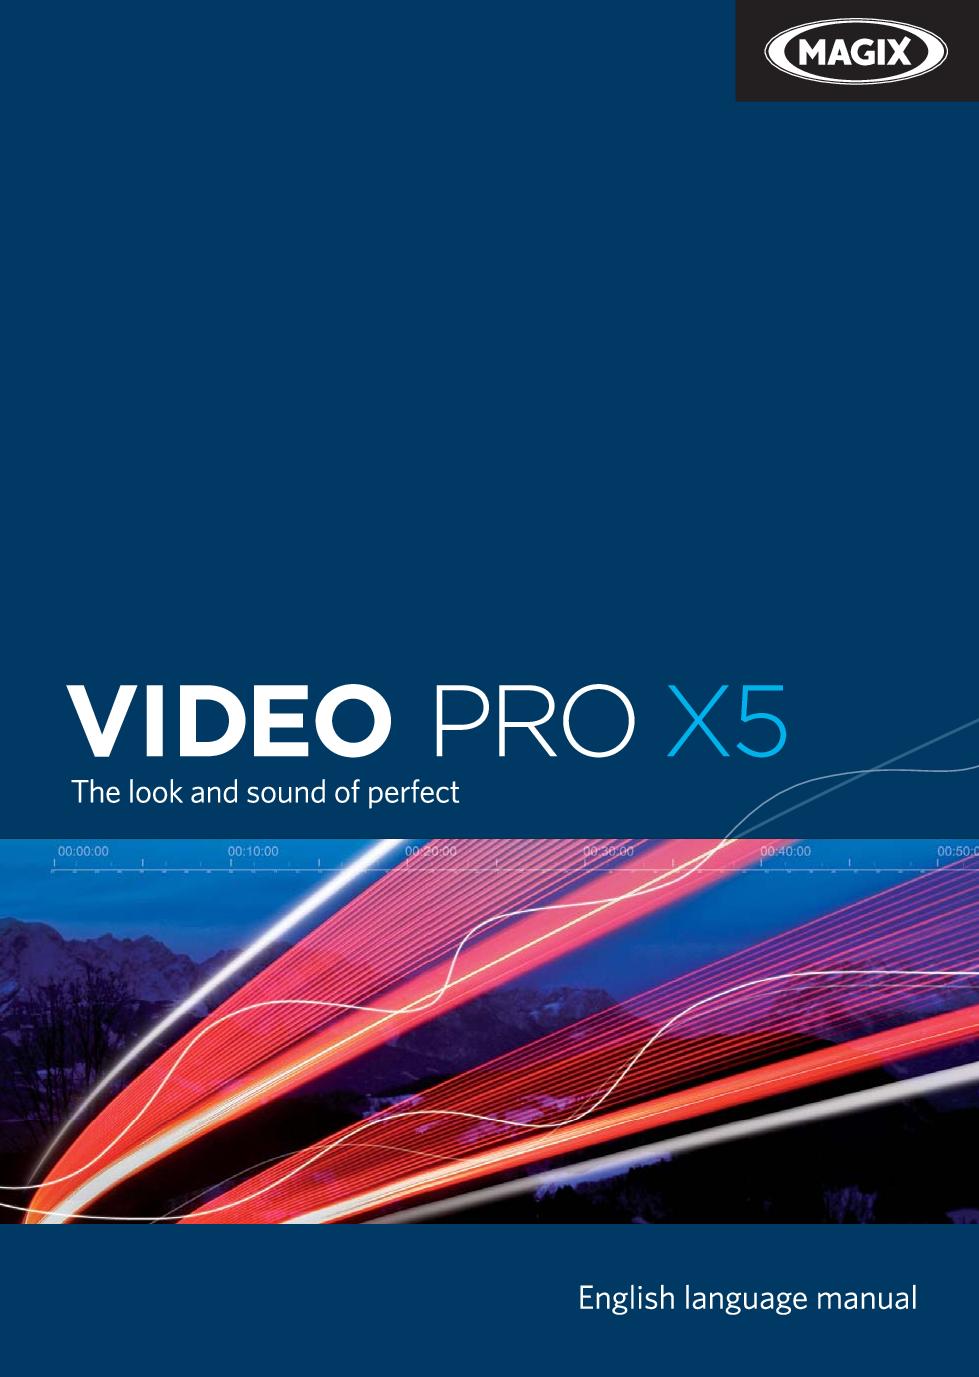 Magix Video Pro X5 Instruction Manual En Filethree Ic Circuit Chipsjpg Wikimedia Commons